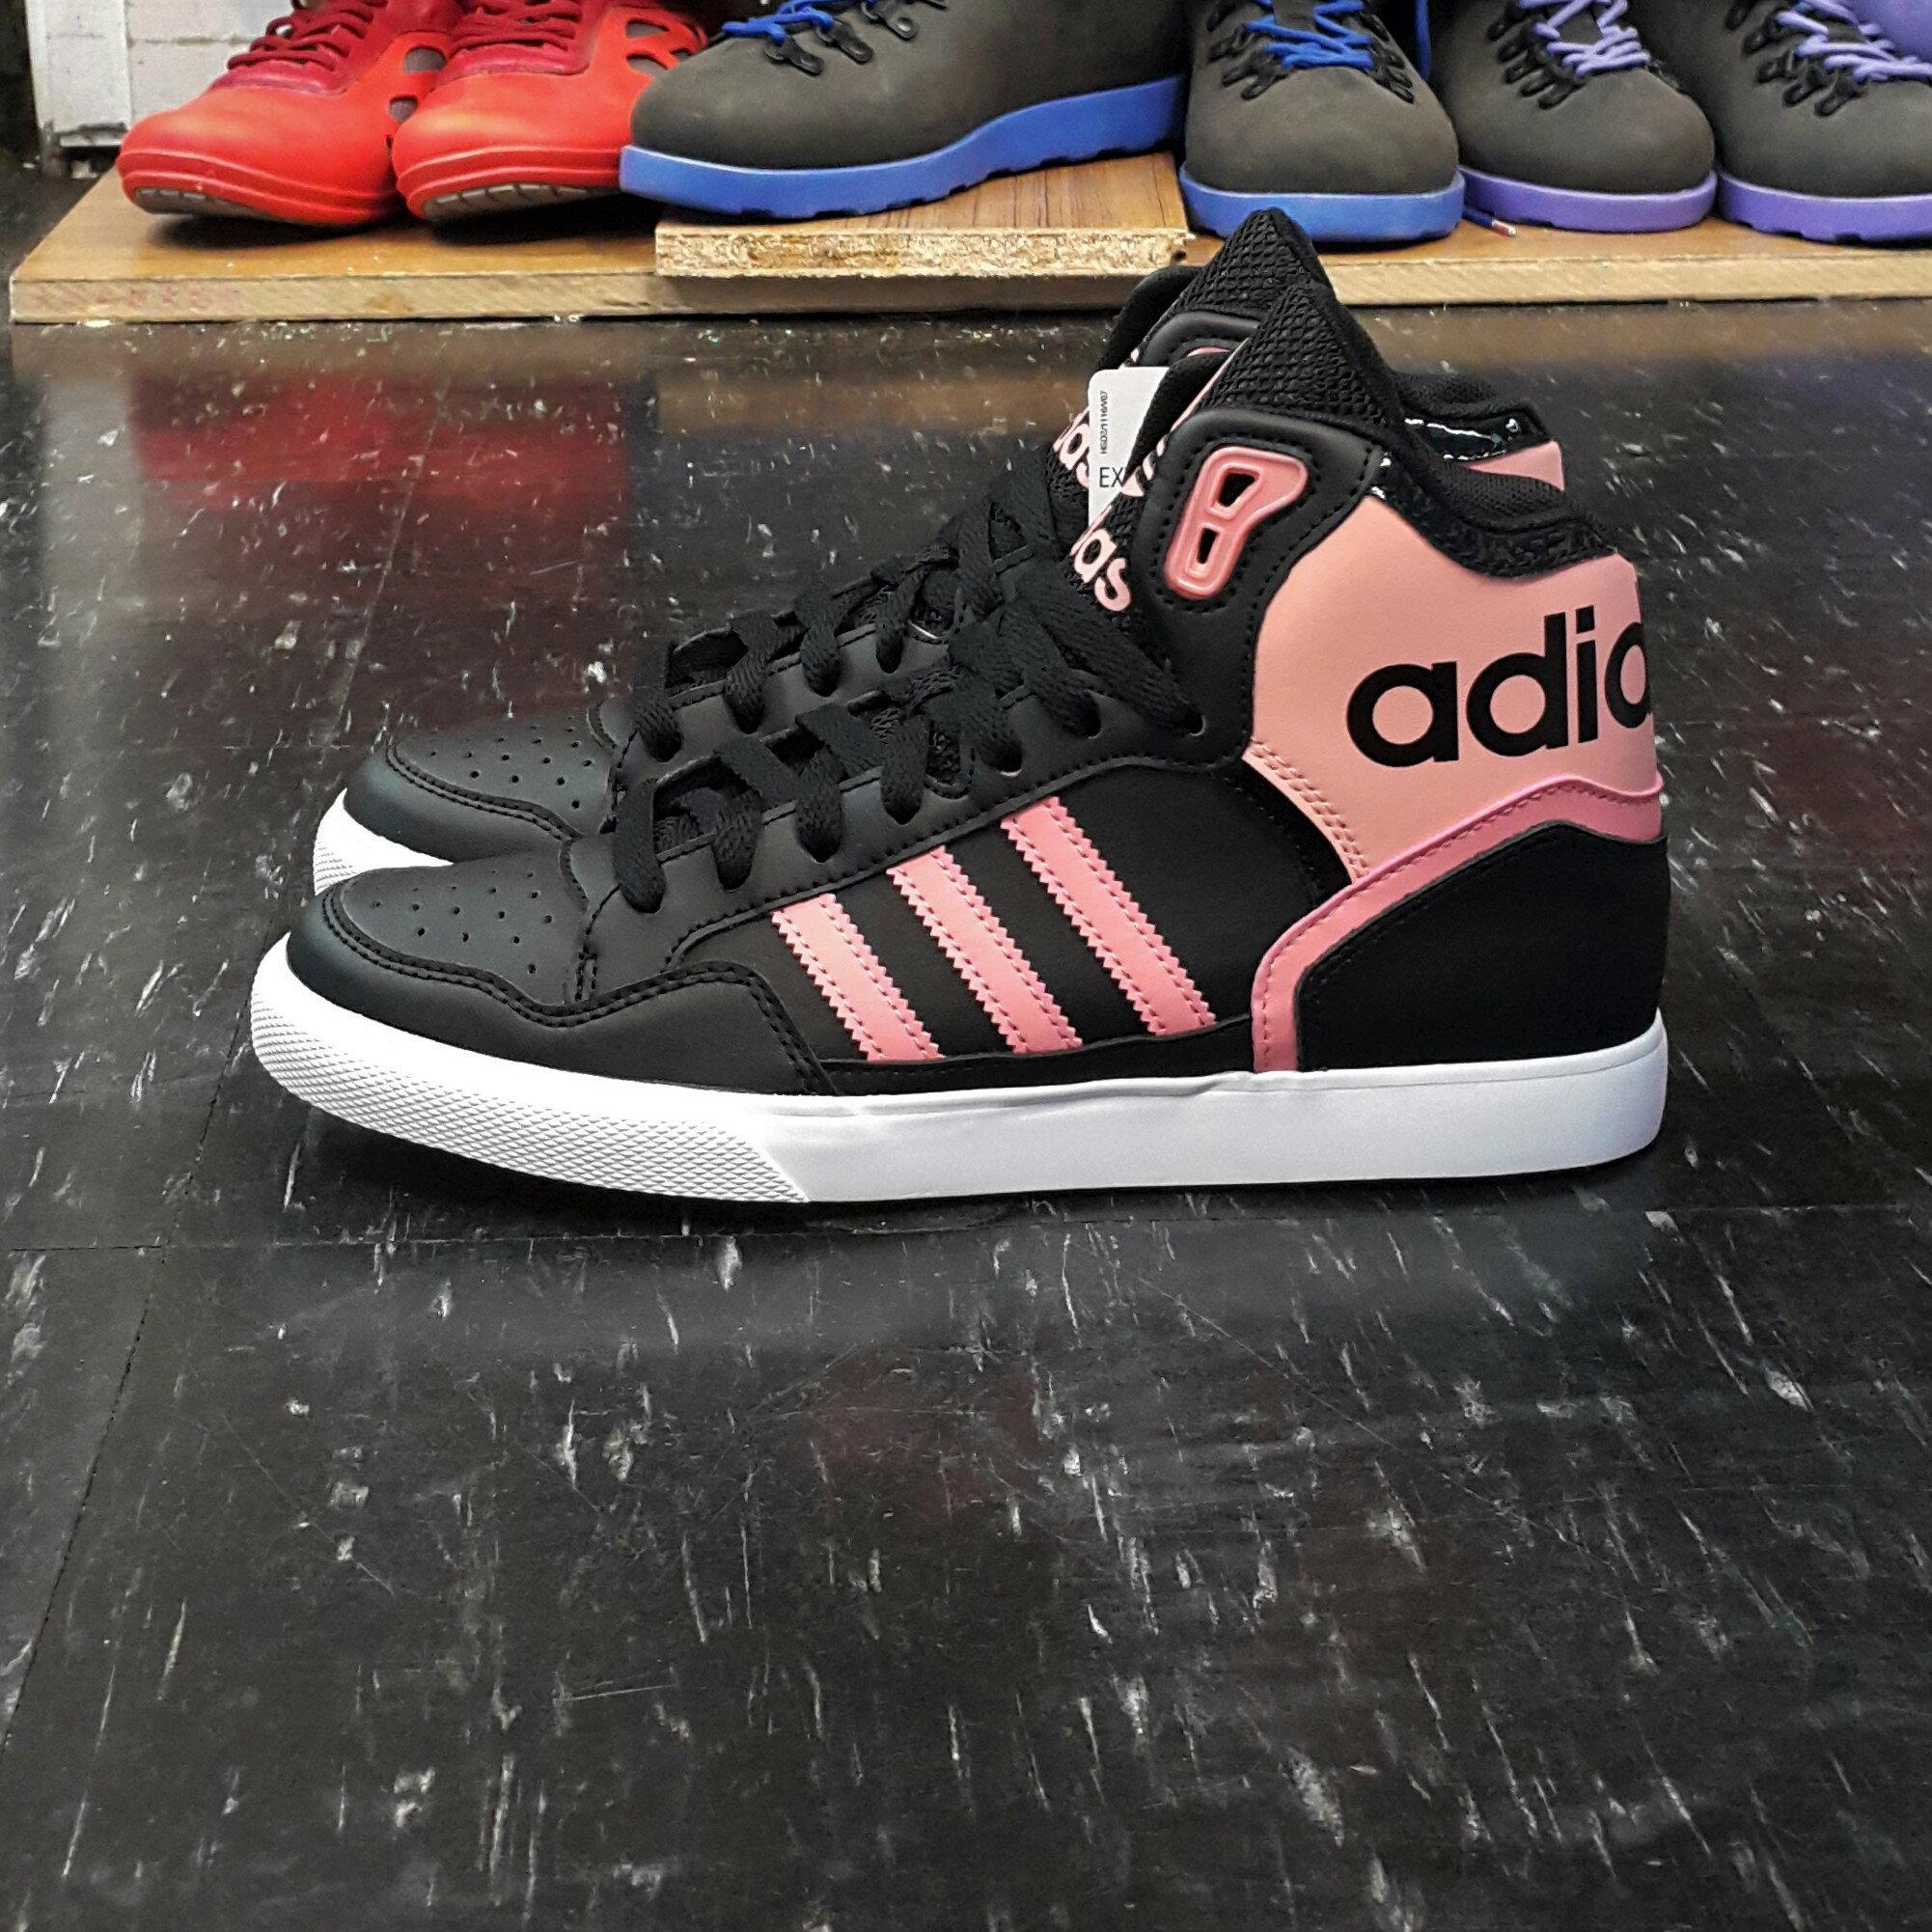 adidas EXTABALL W 高筒 大鞋舌 黑色 粉紅色 黑粉 皮革 CP9625